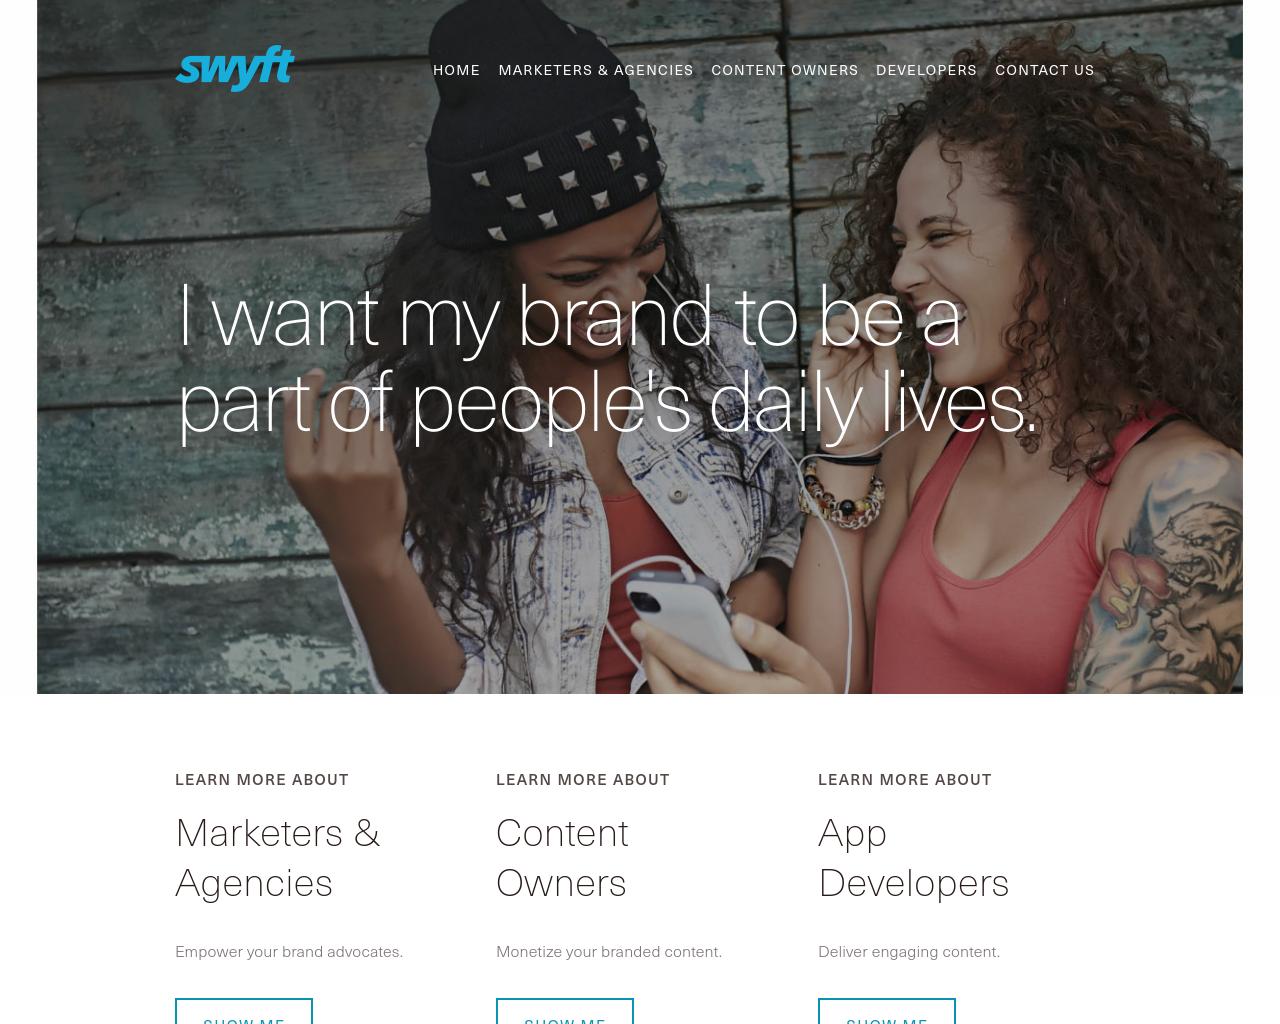 Swyft-Media-Advertising-Reviews-Pricing